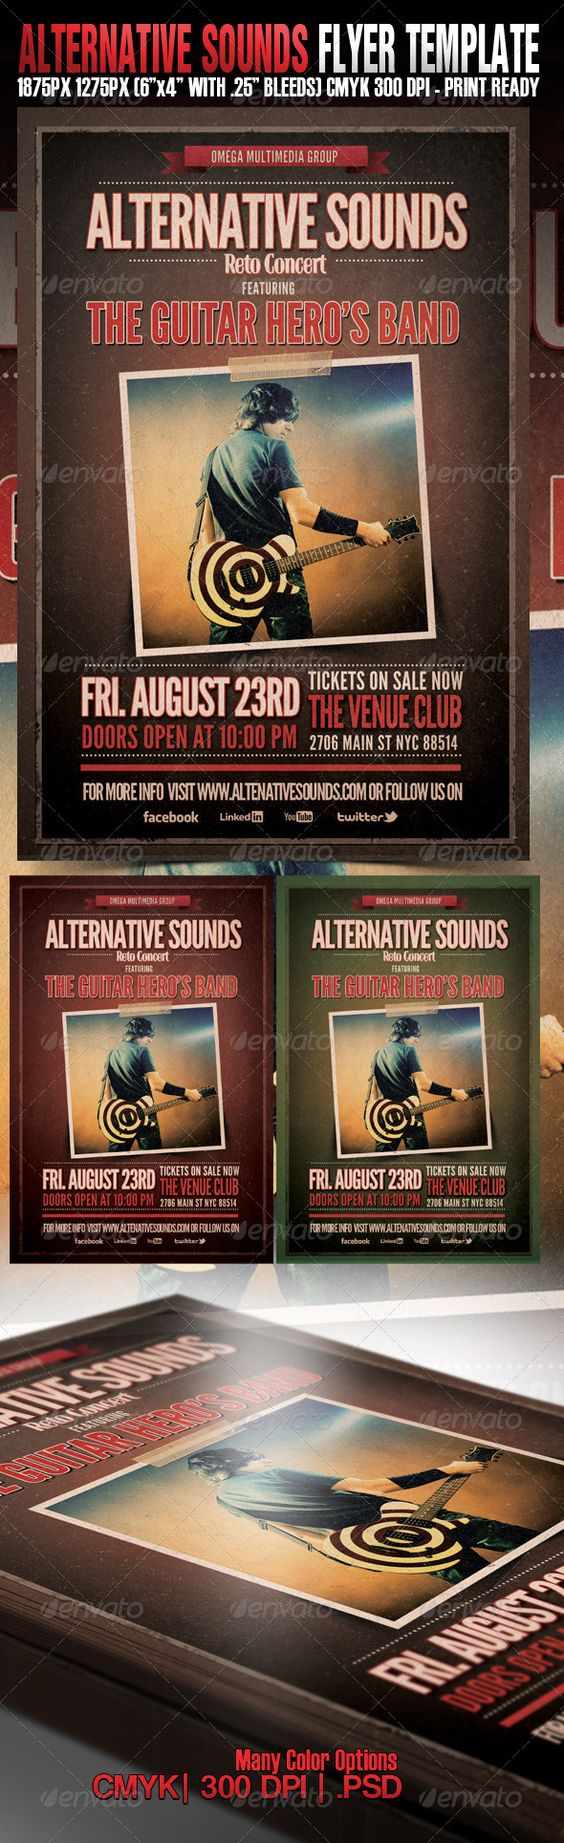 Alternative Sounds — Photoshop PSD #fall #template • Available here → https://graphicriver.net/item/alternative-sounds/2689253?ref=pxcr